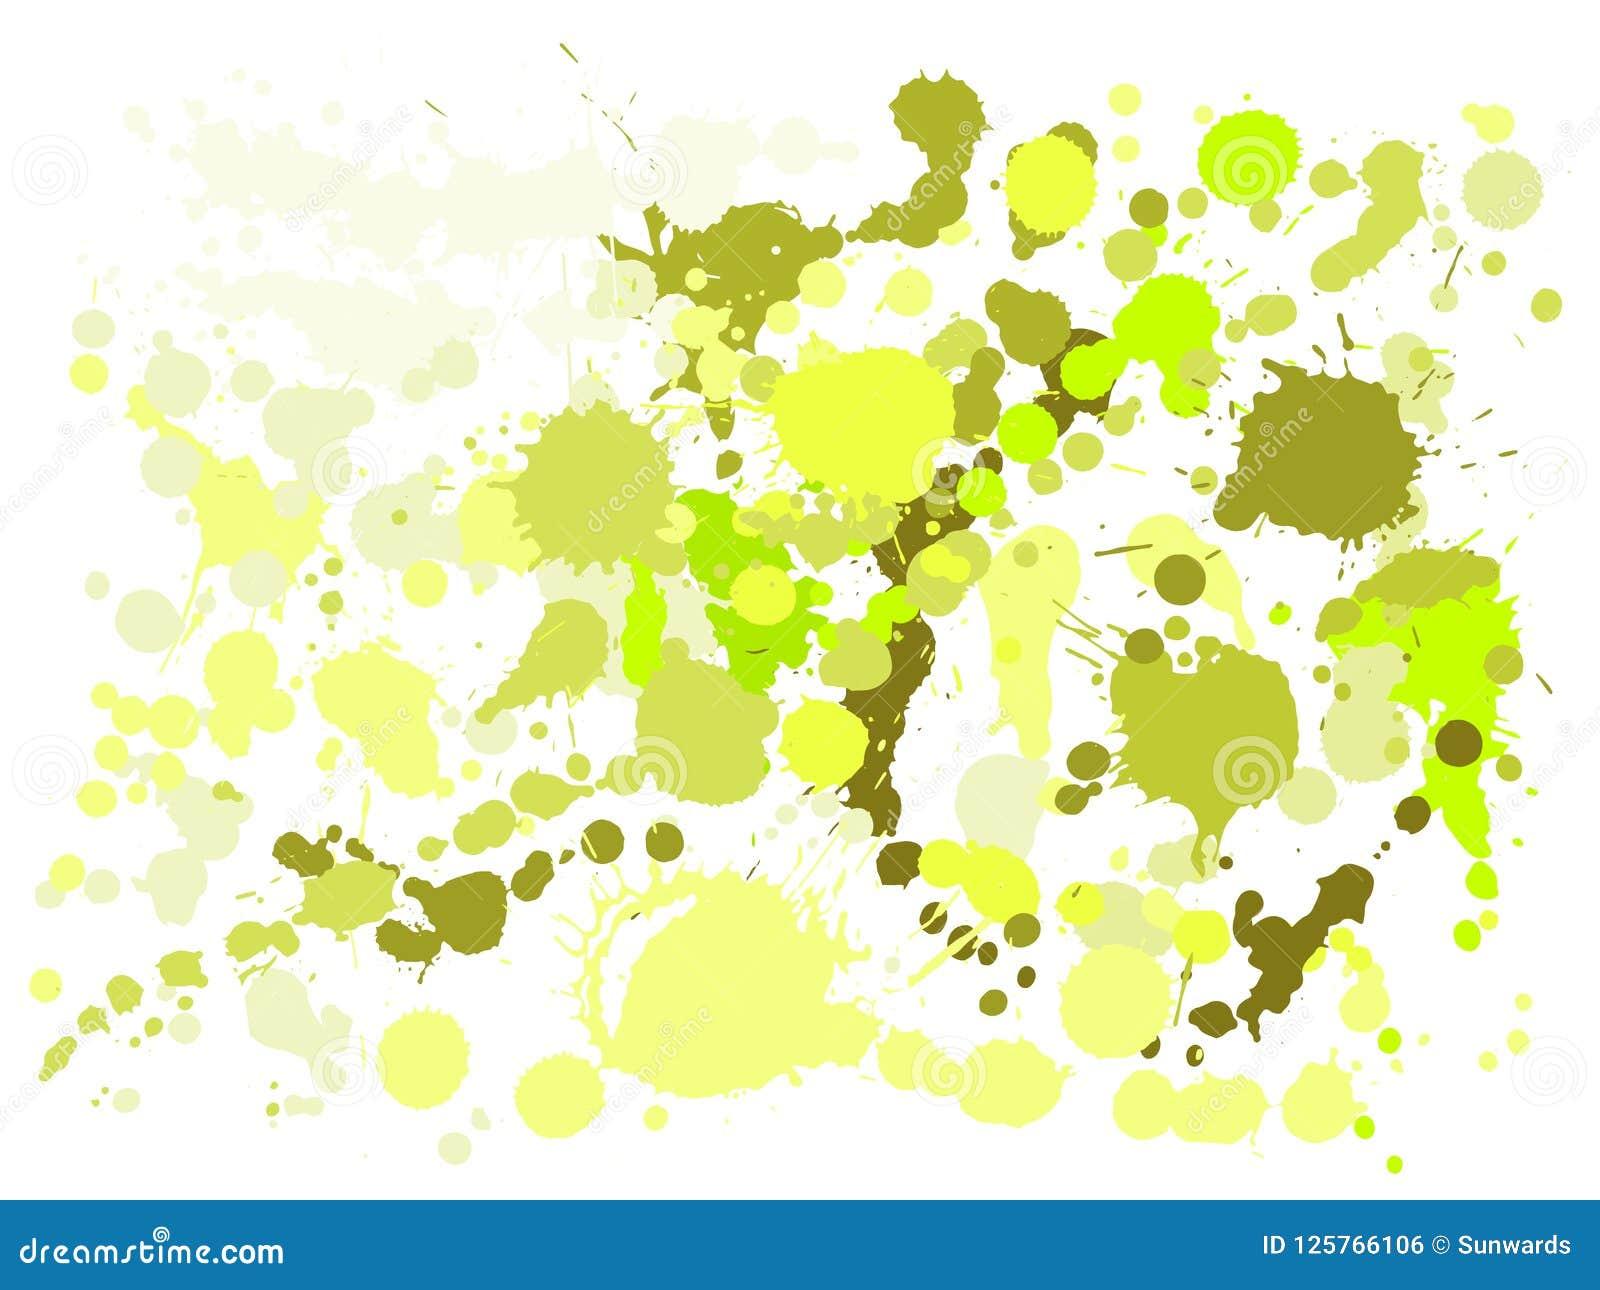 La pintura del aguazo mancha vector del fondo del grunge La salpicadura  fresca de la tinta 4dfcc8aa45c0